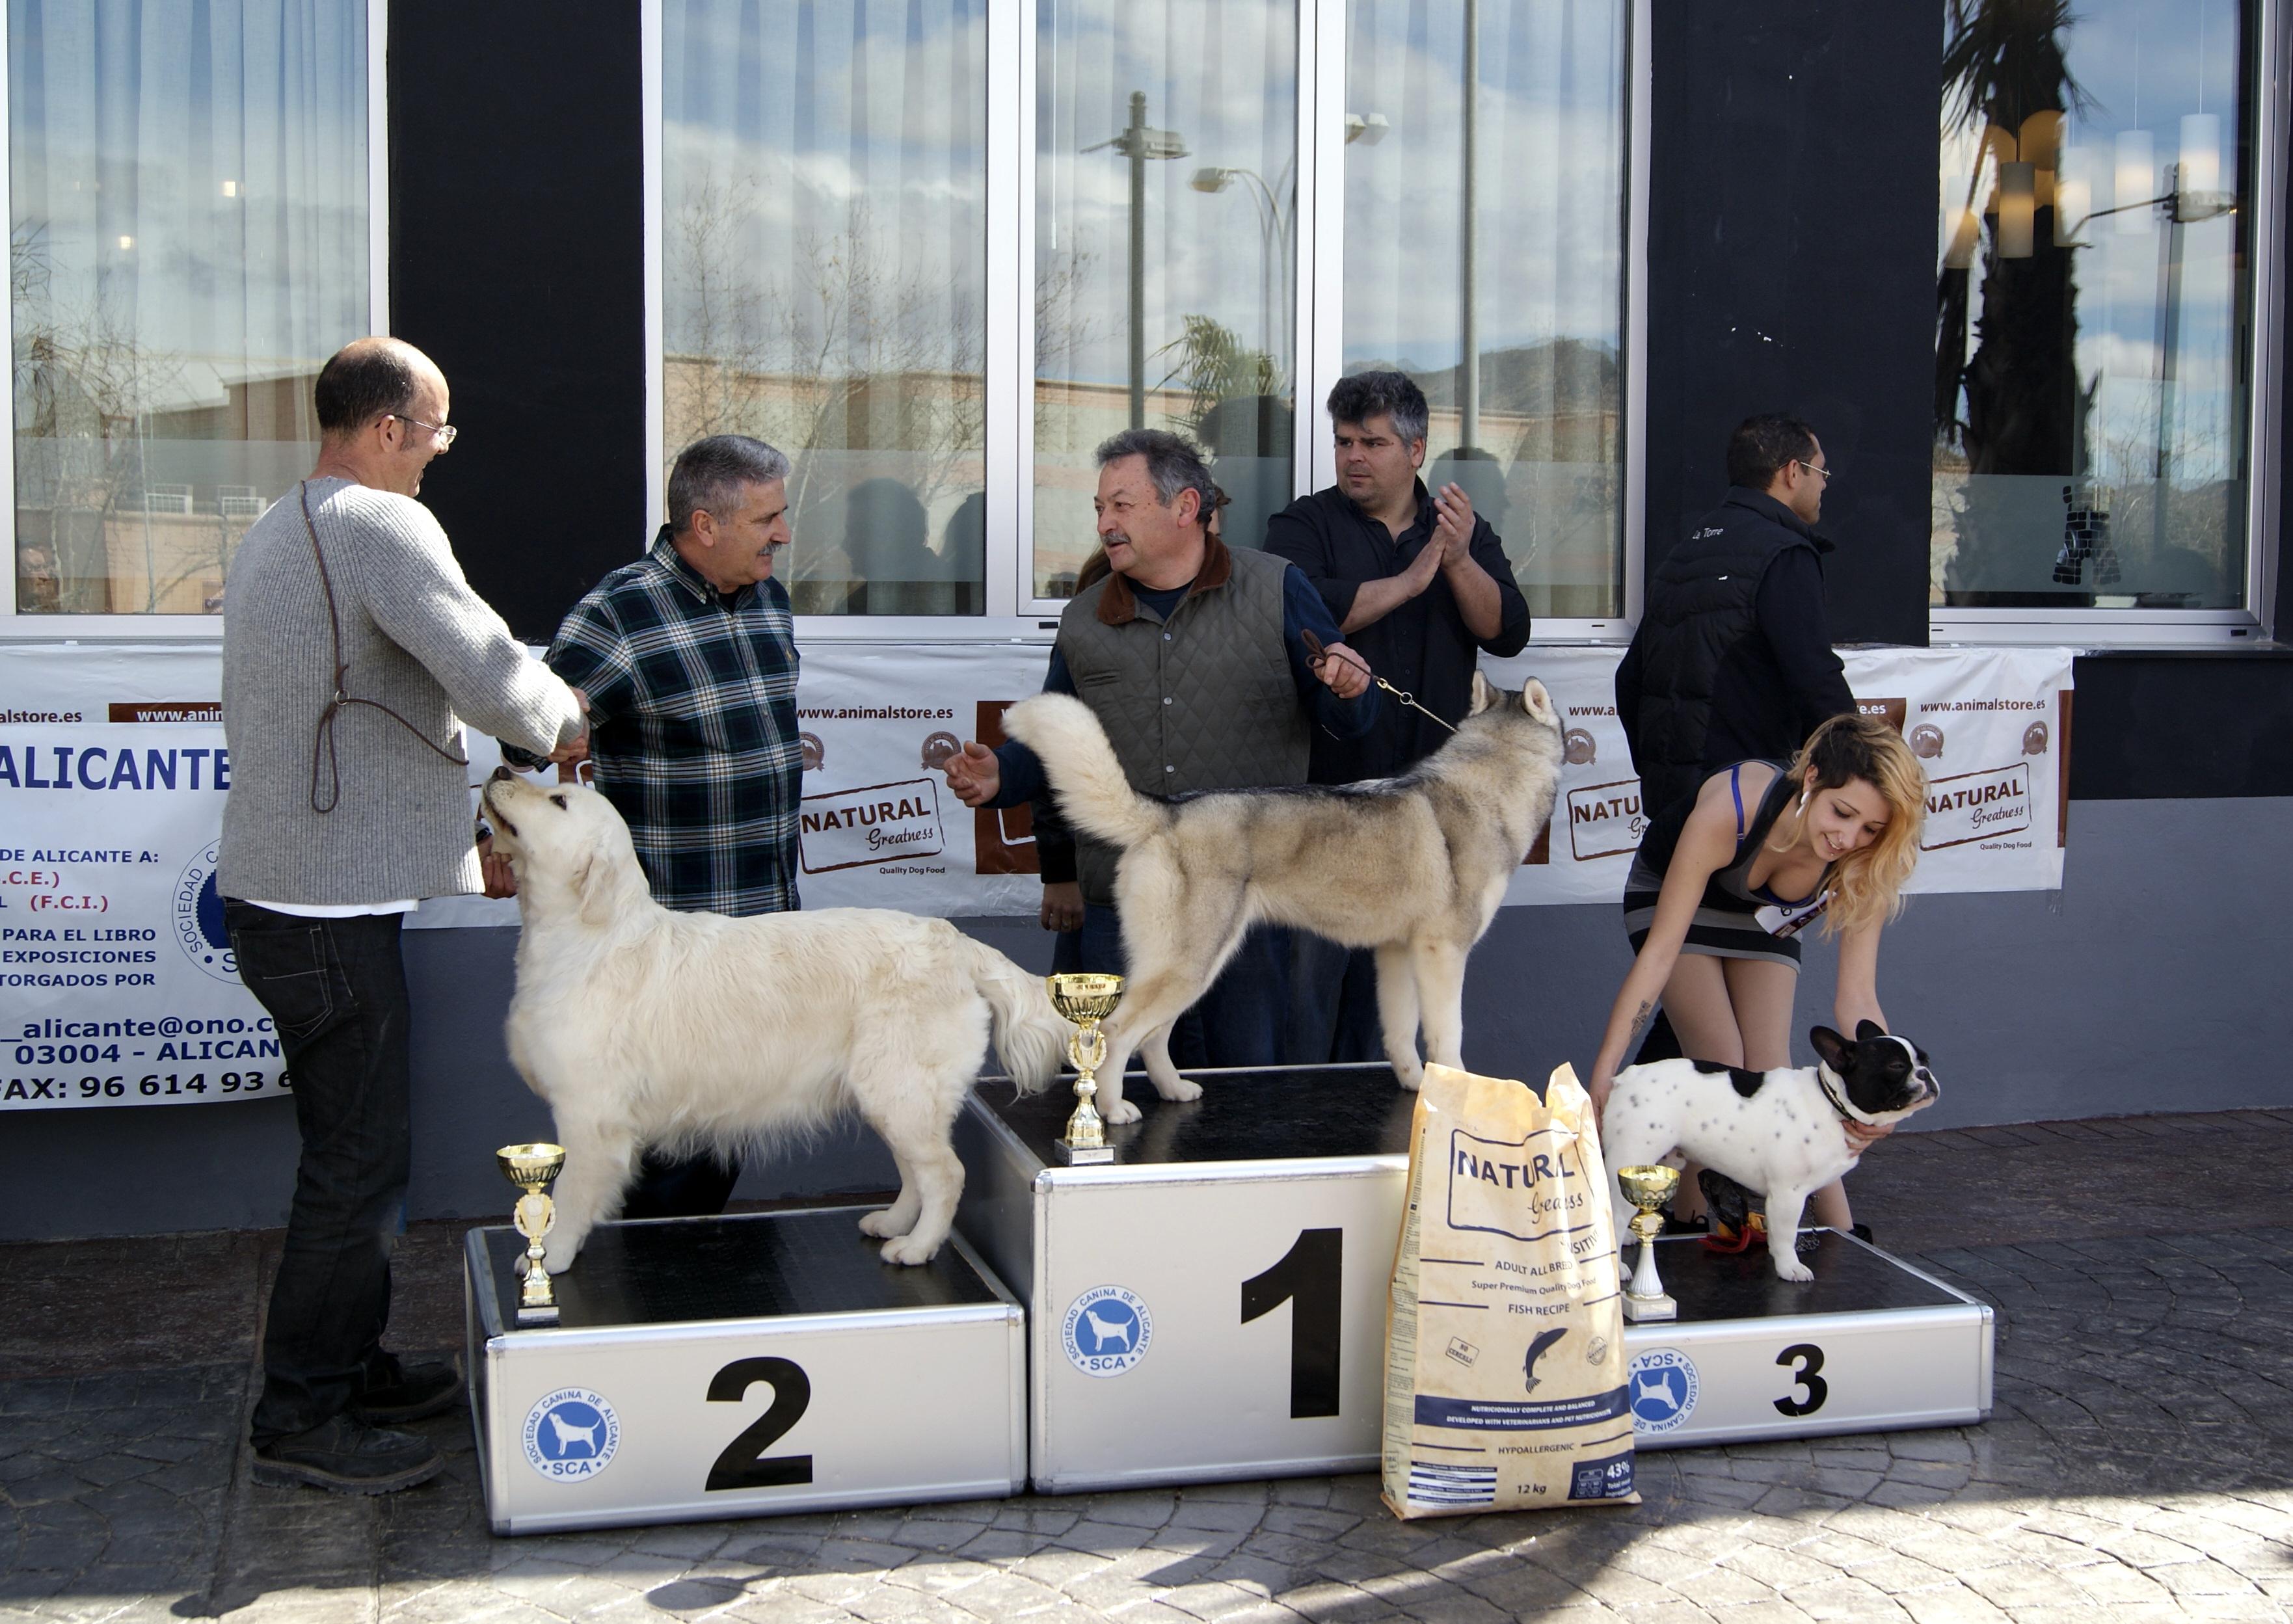 Bulldog frances carlbulls Buso de Carlbulls ALICANTE